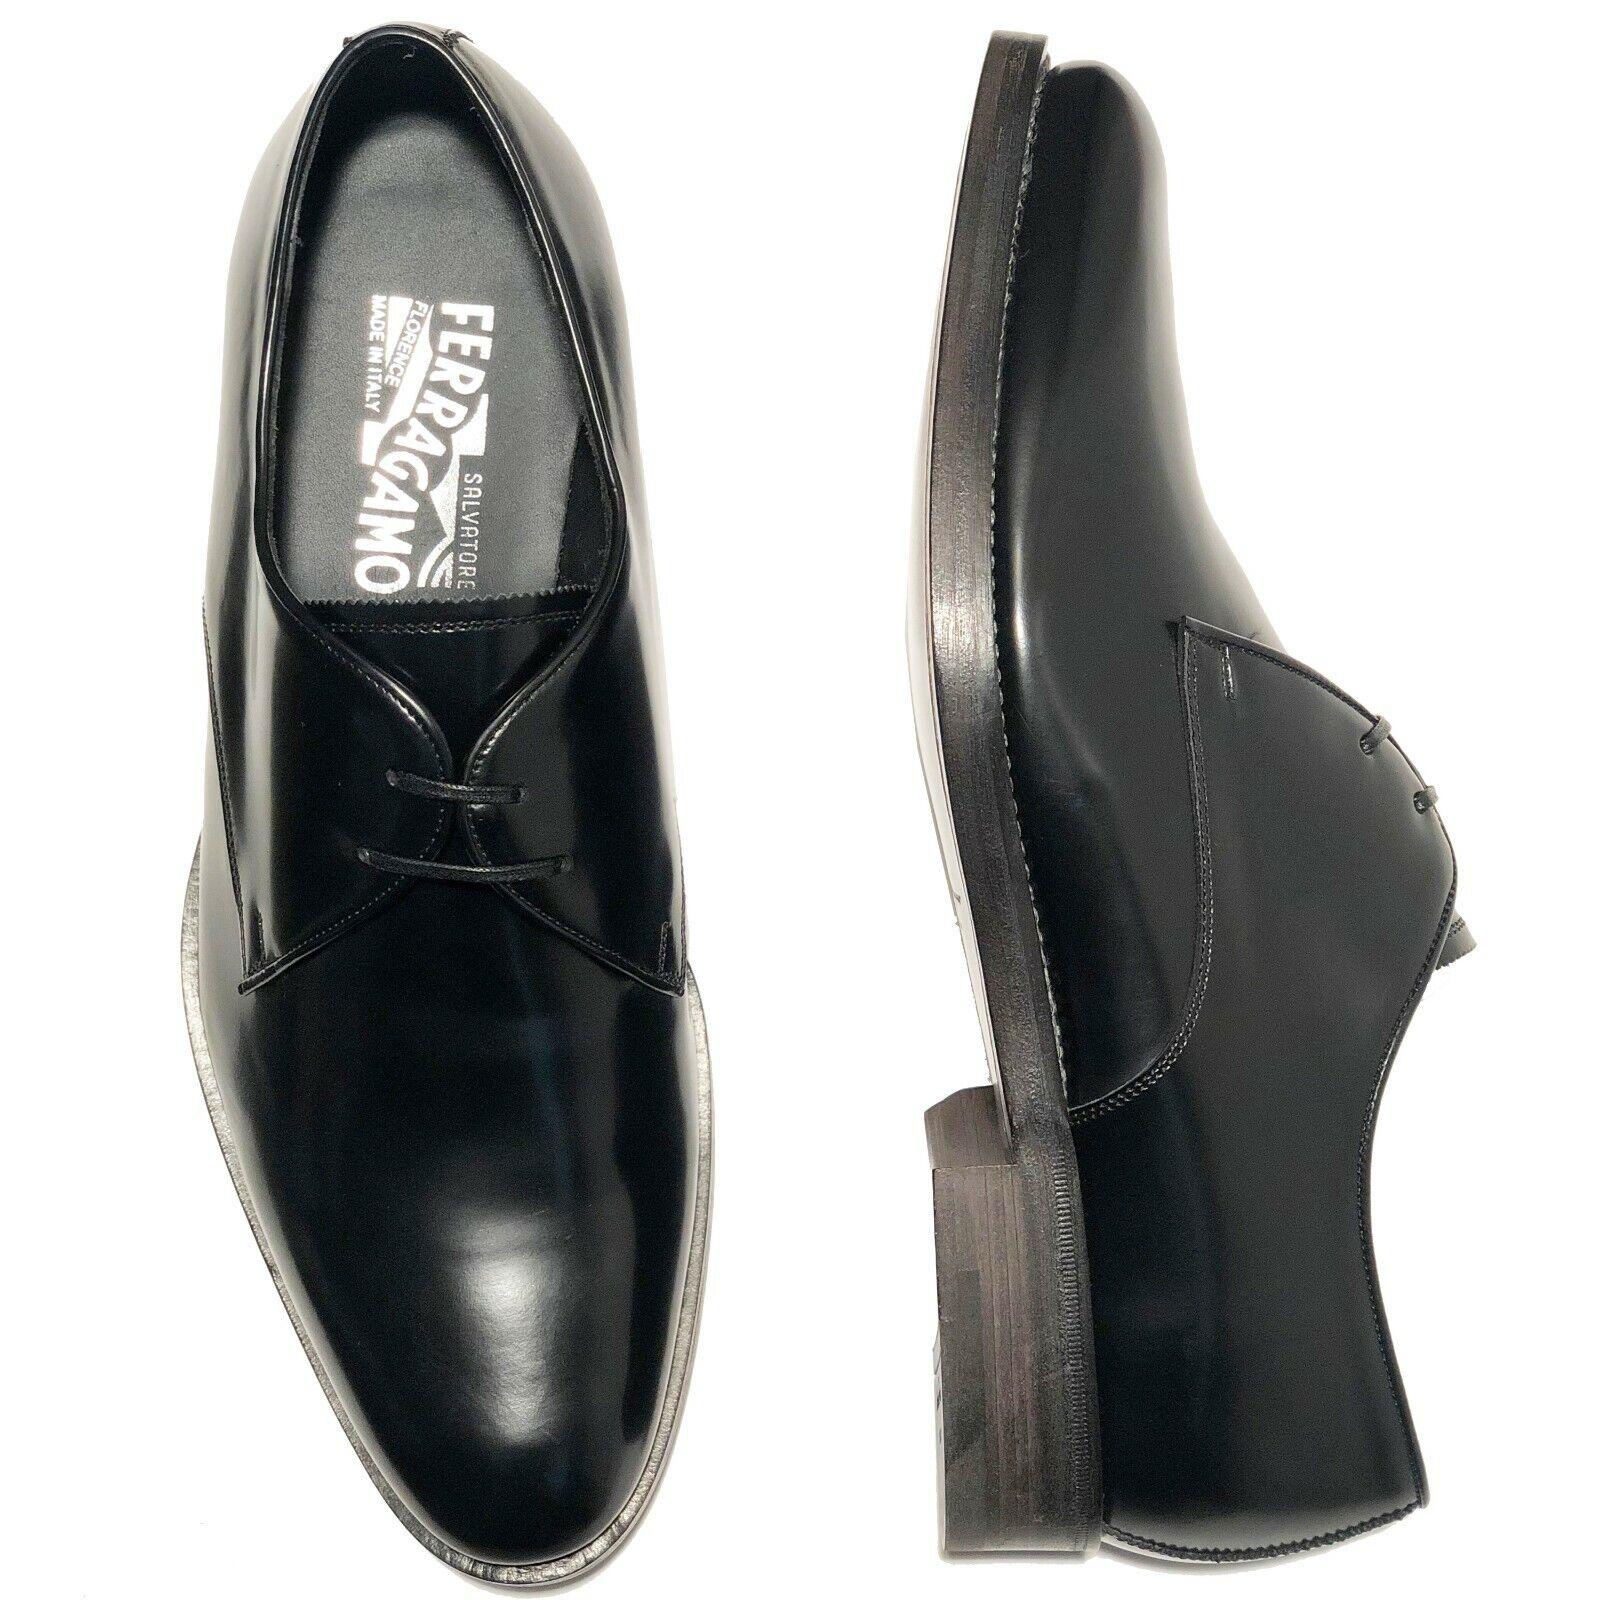 Ferragamo Men's Leather 10 EE 43 Black new shoes Oxford shoes Tuxedo Wedding Formal